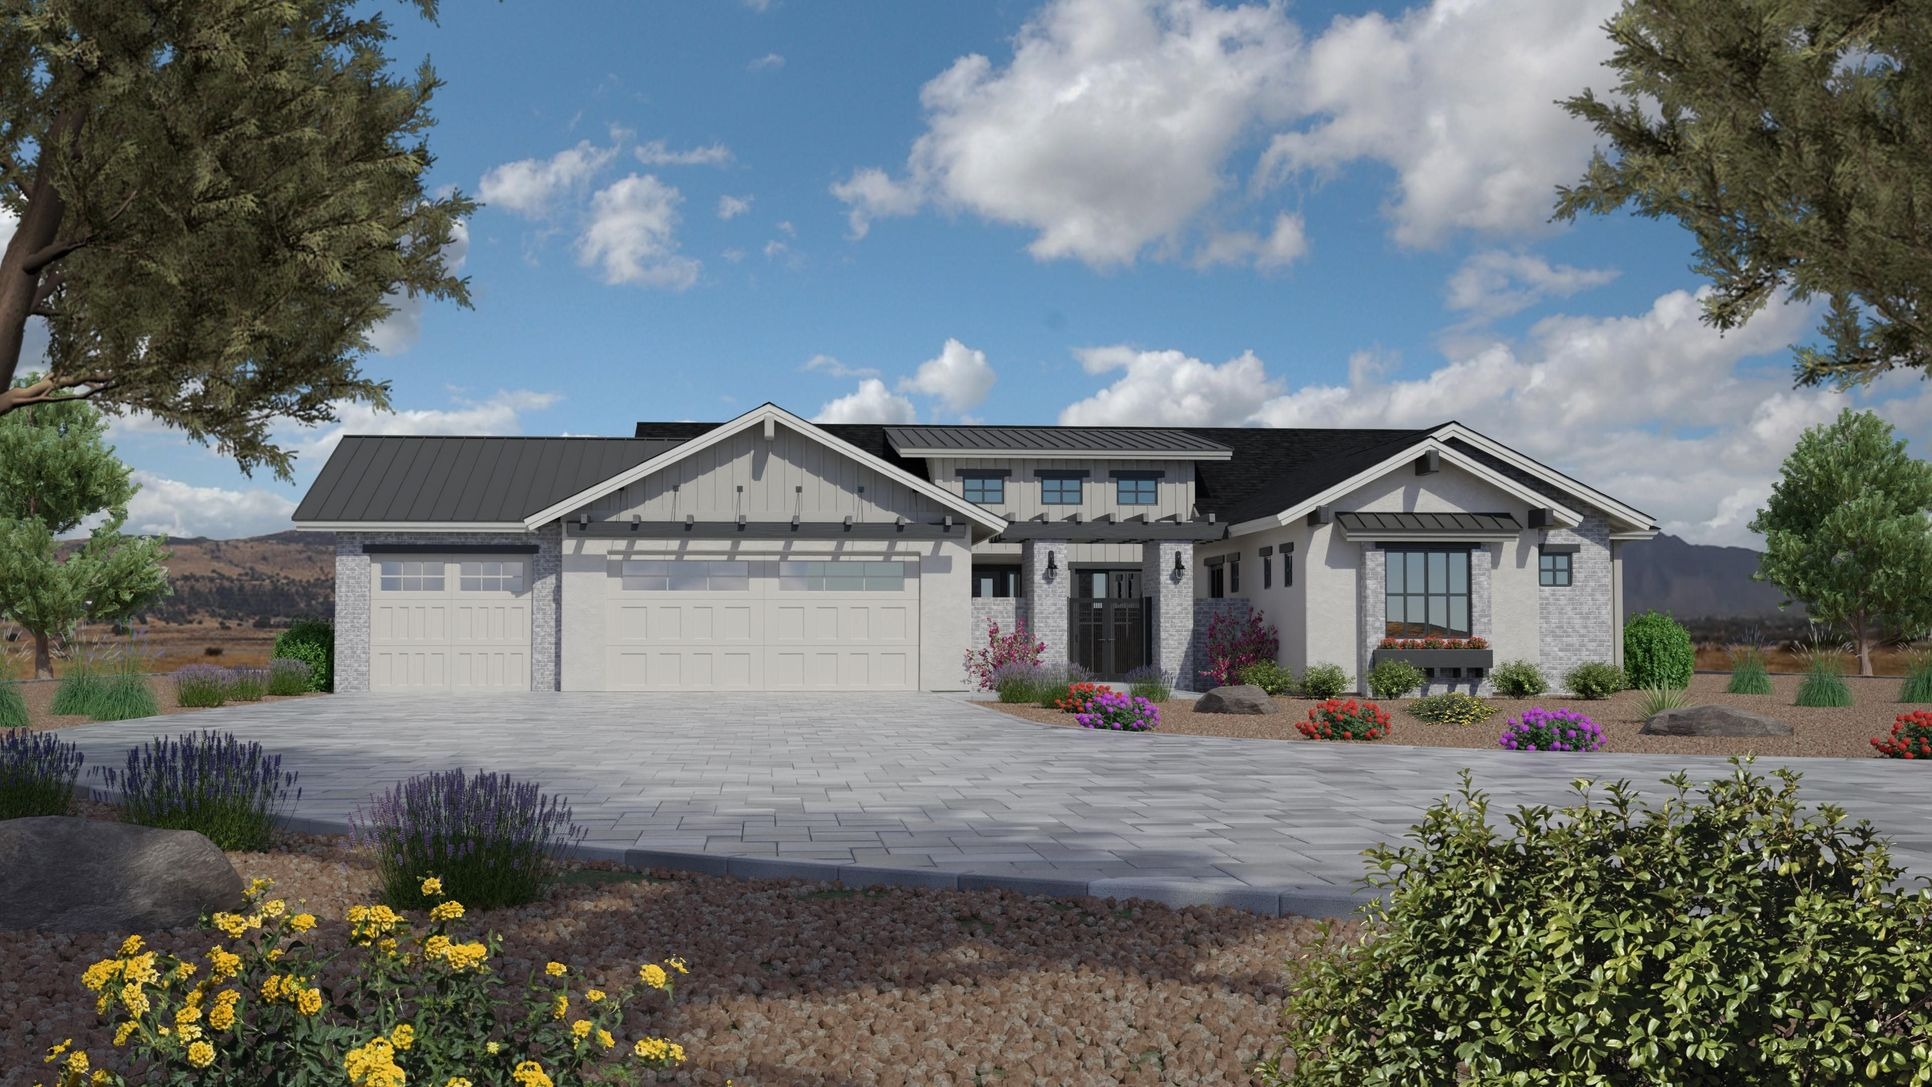 Jasper Plan 2672 - Farmhouse Elevation:Elevation